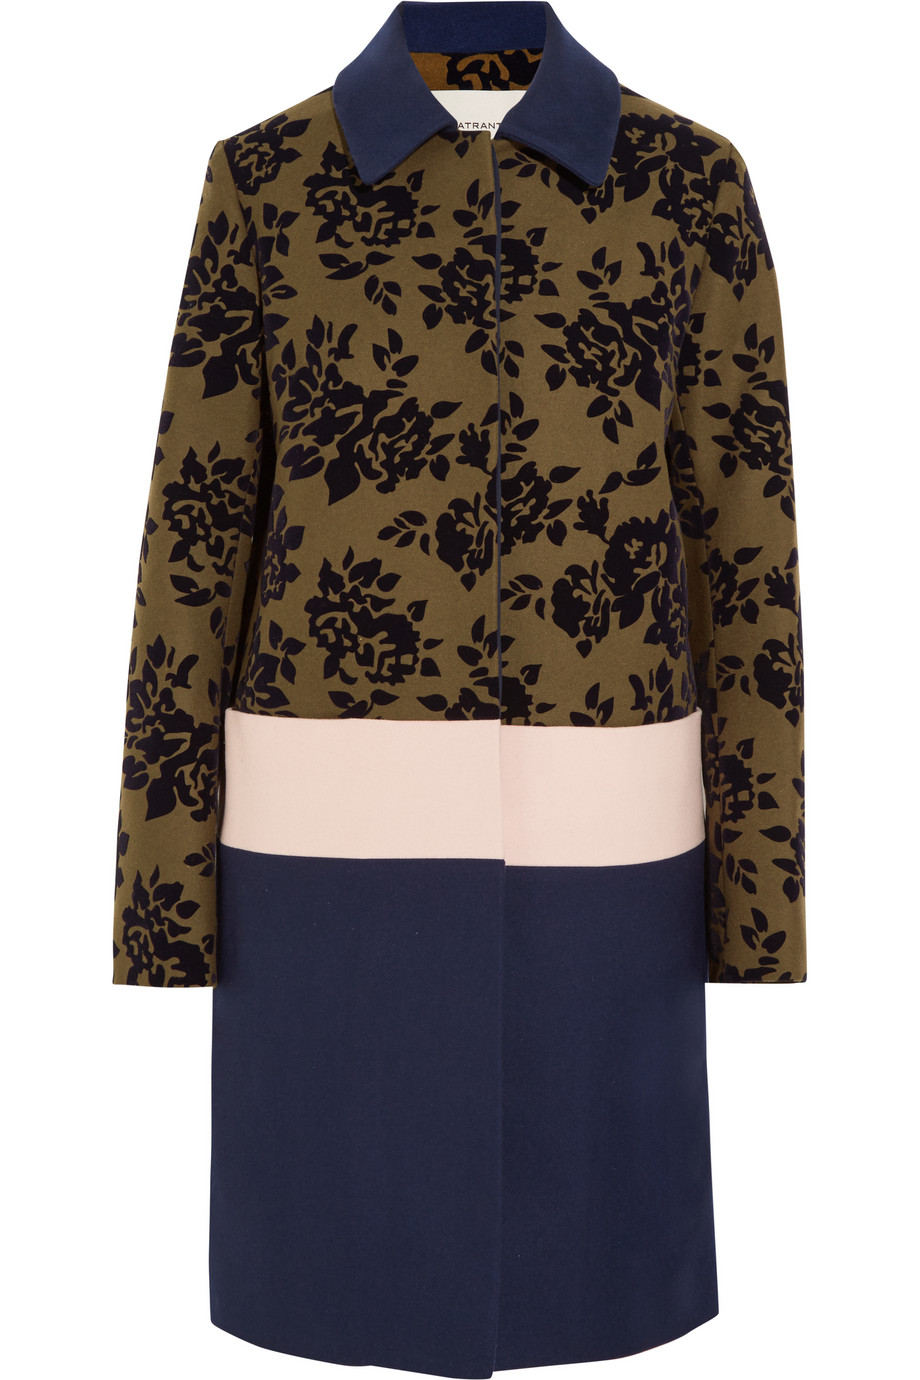 Mary Katrantzou Jamie Flocked Wool-Blend Coat, Army Green/Navy, Women's, Size: 6